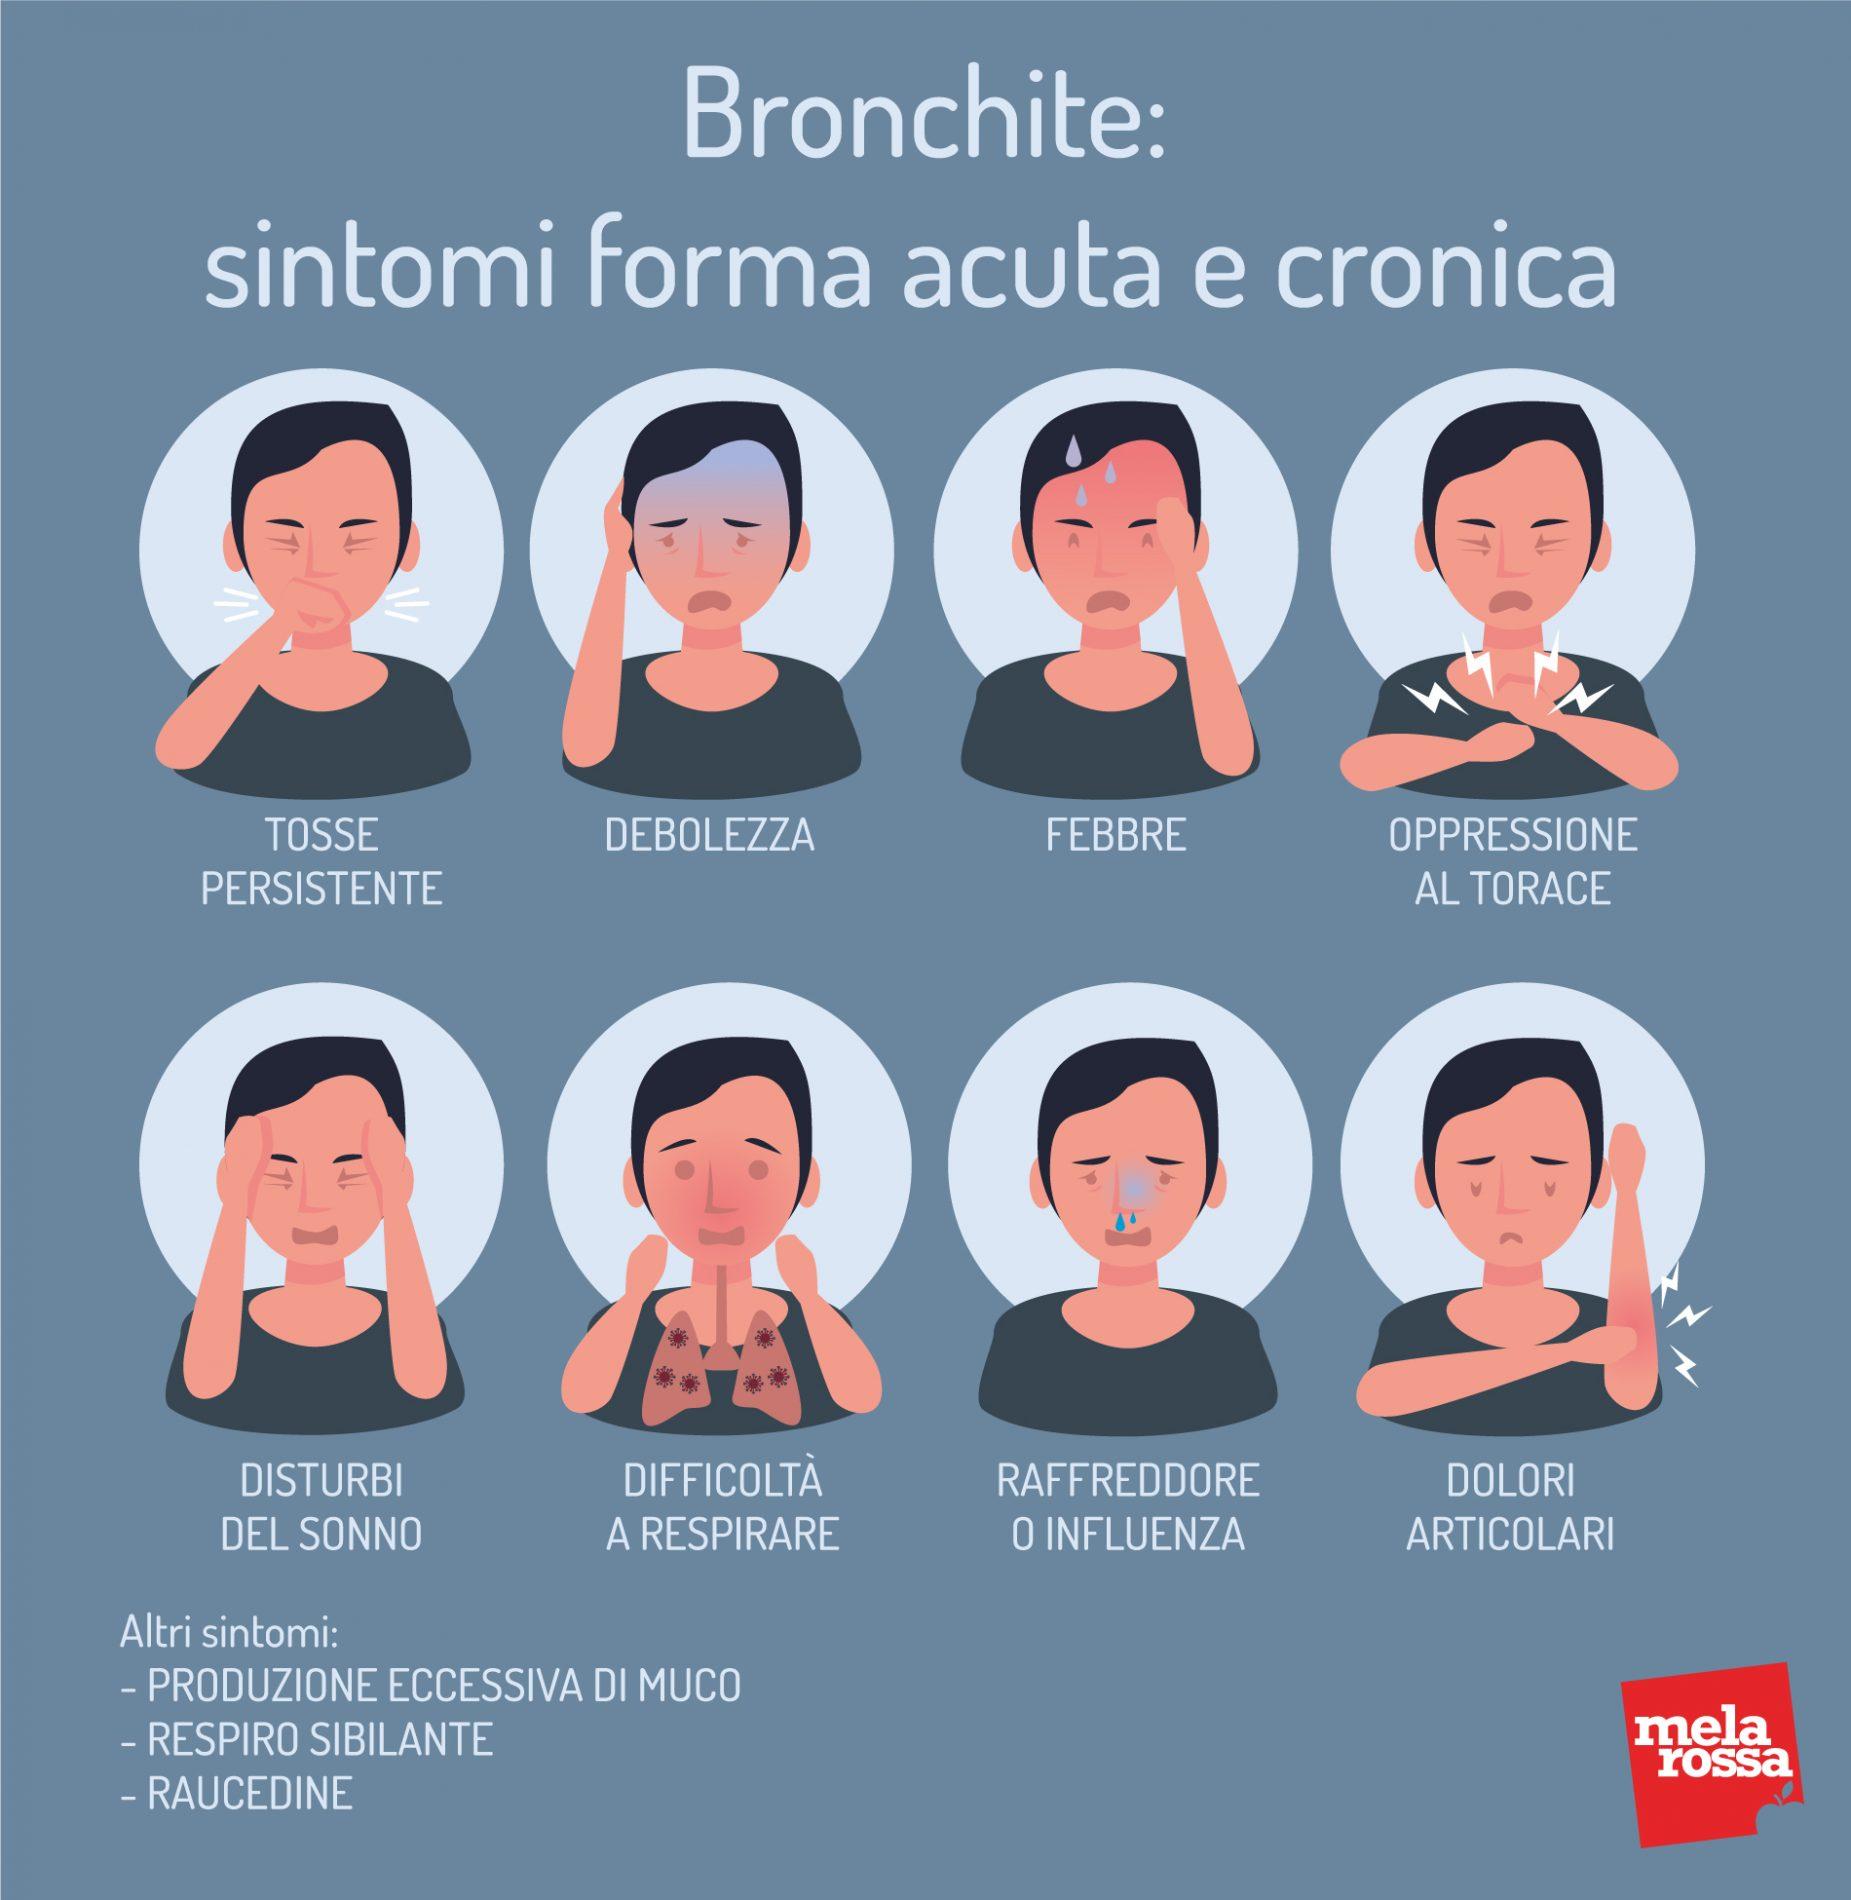 malattie respiratorie: bronchite